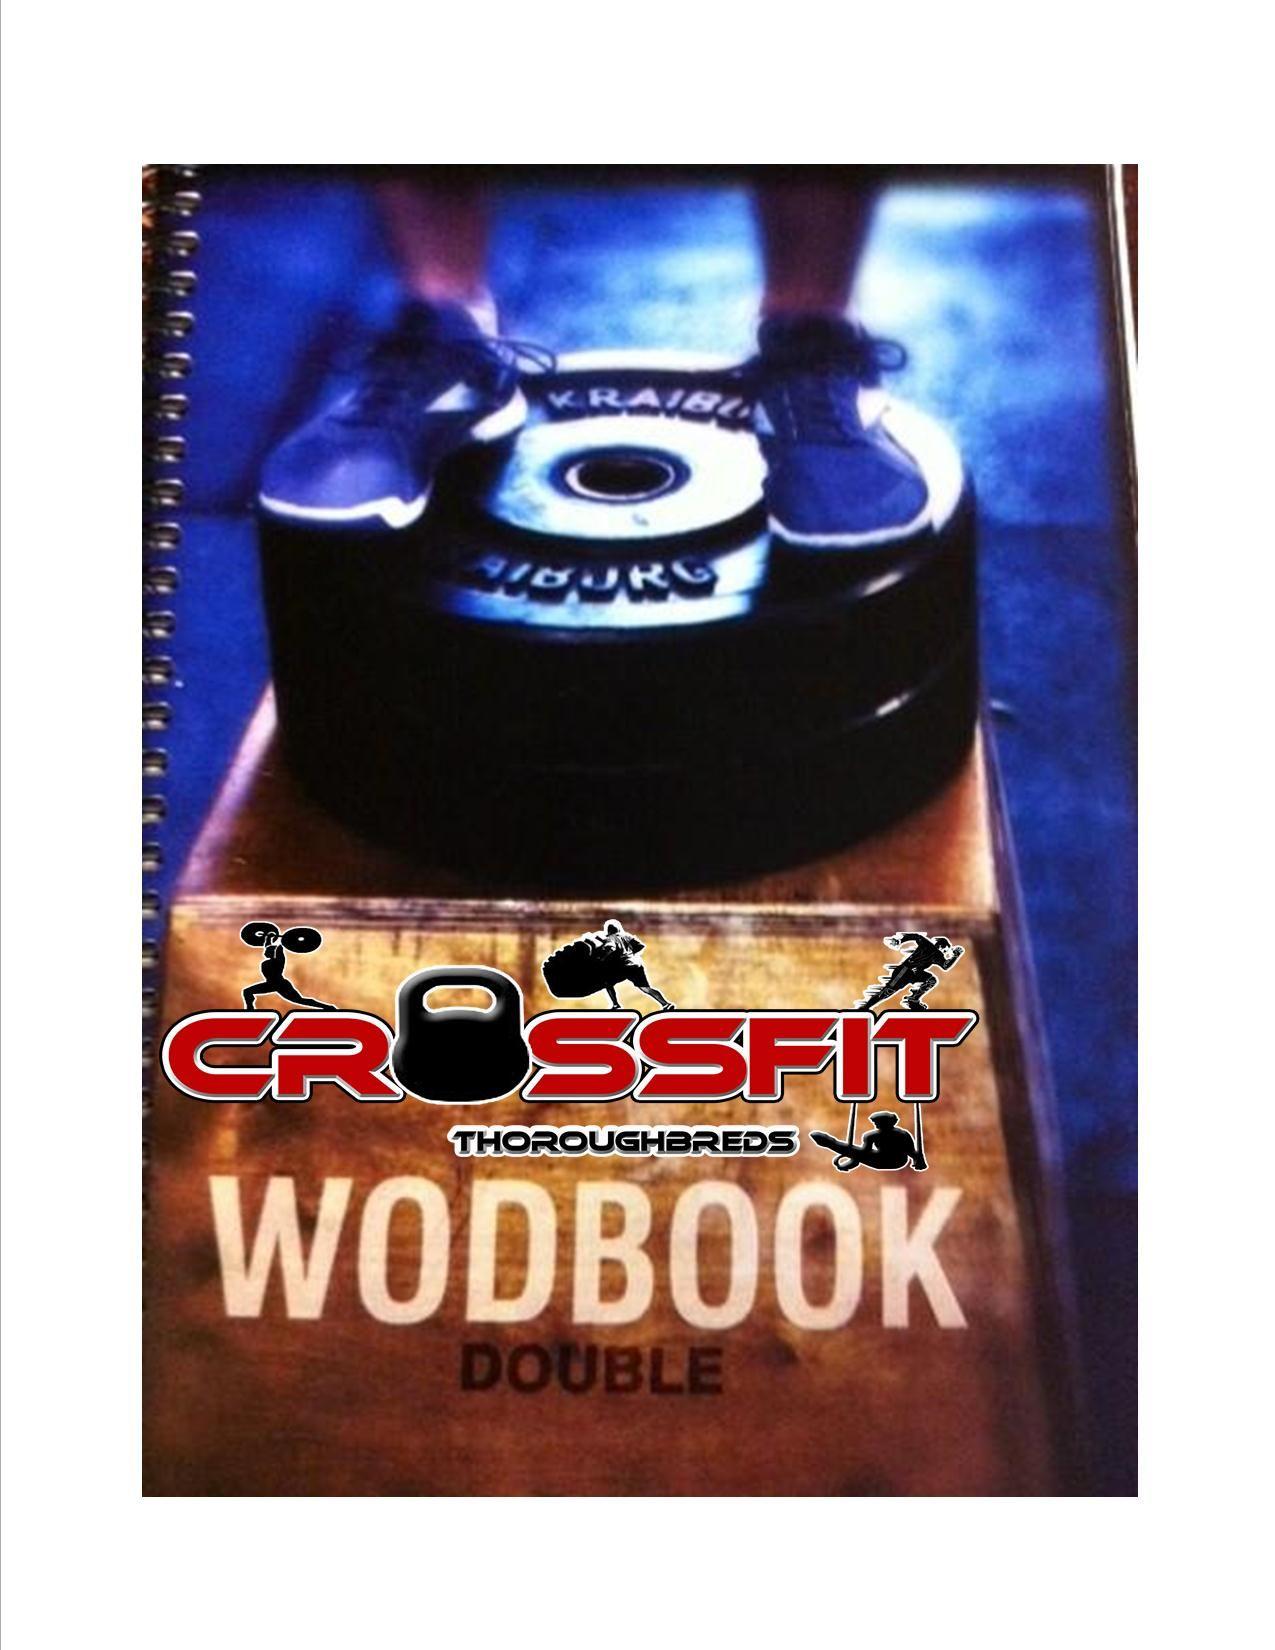 CFTB WOD BOOK  Track all your CrossFit WOD's & strength training    www.crossfittbgear.com